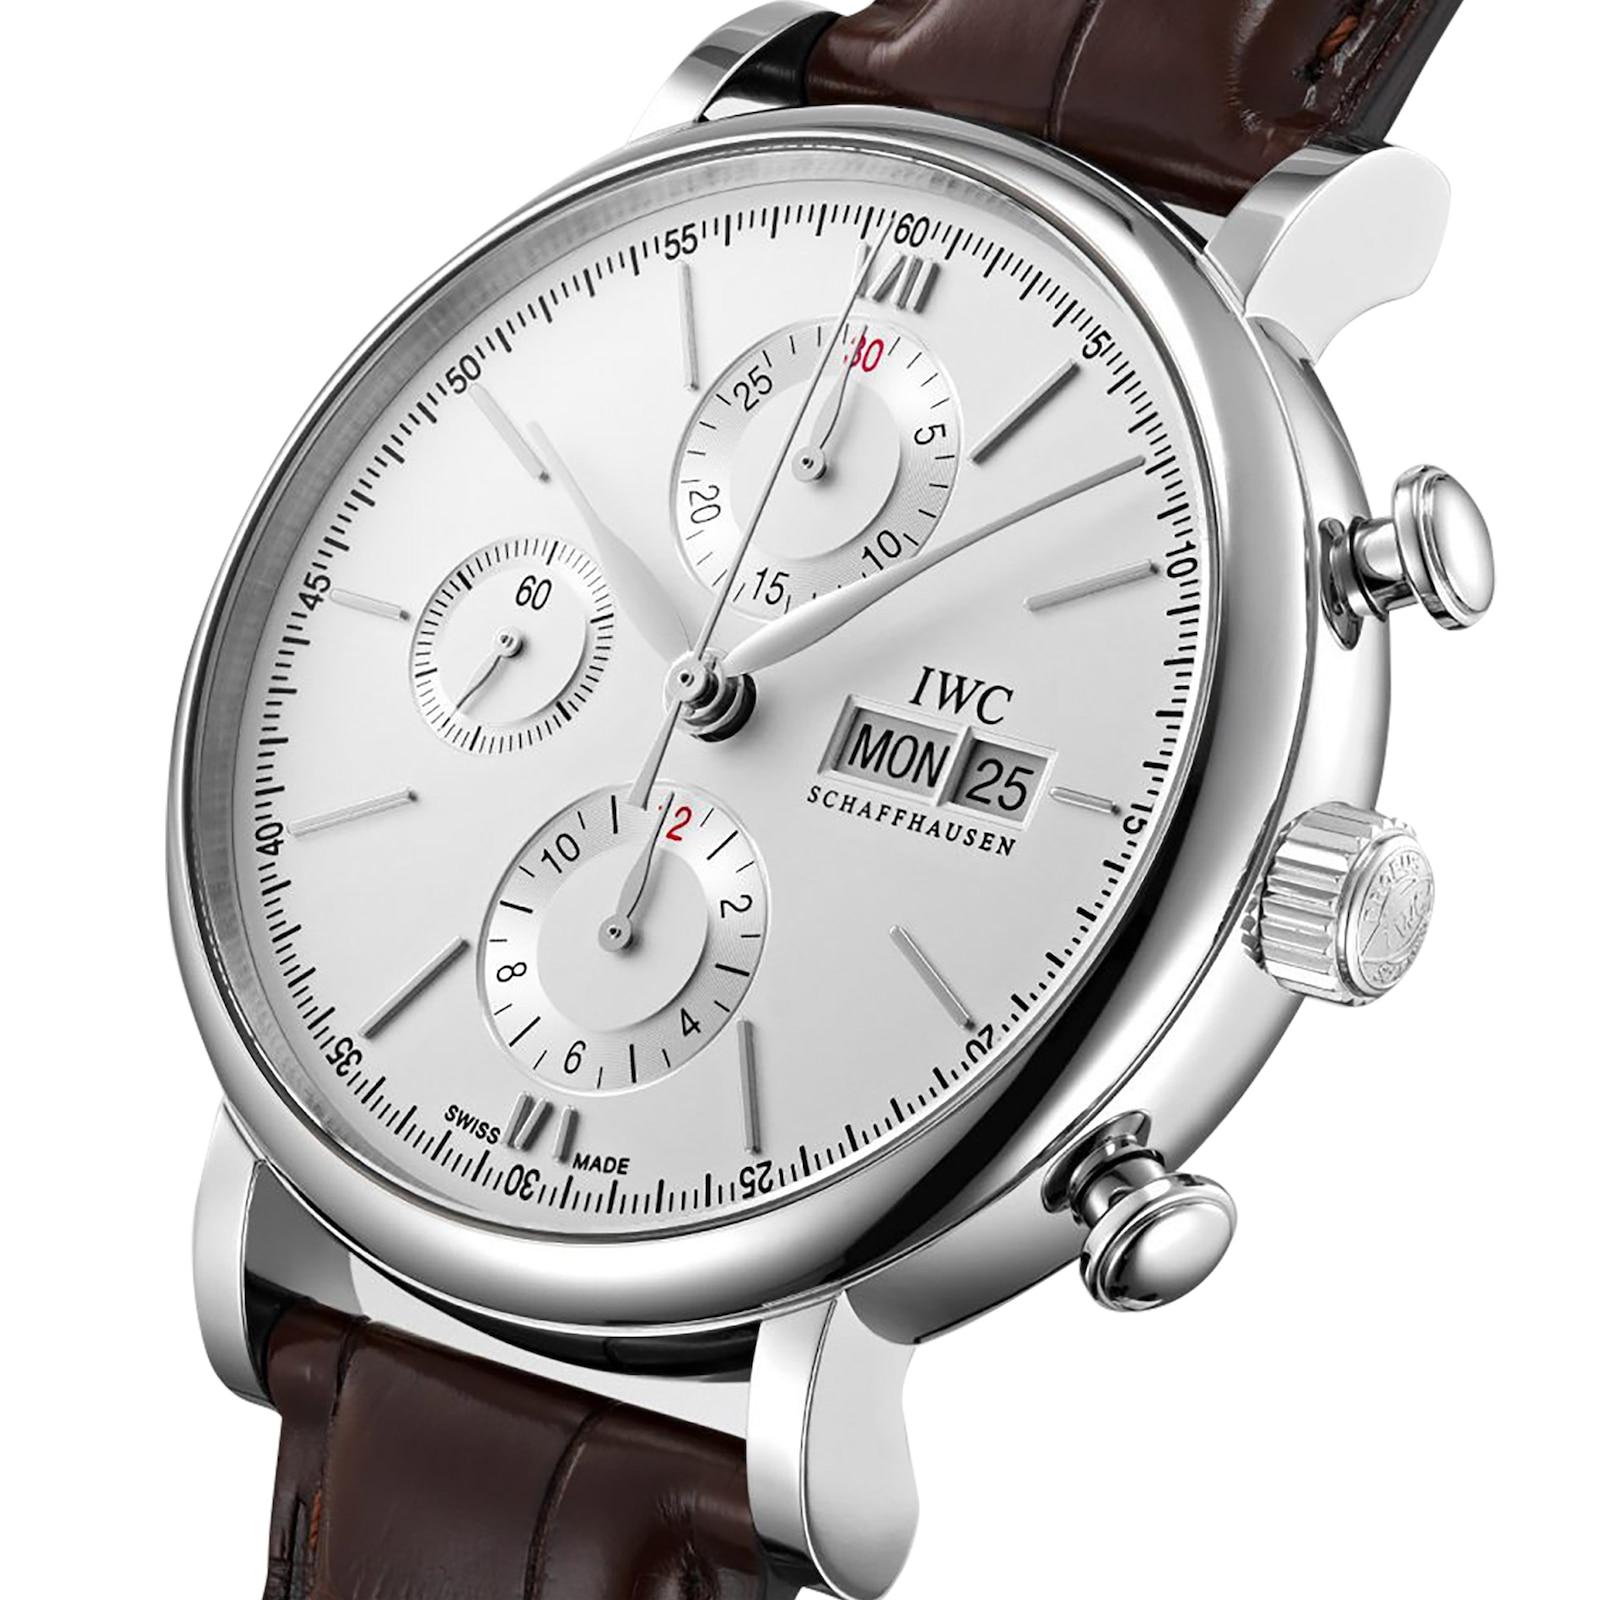 IWC Portofino Chronograph Mens Watch